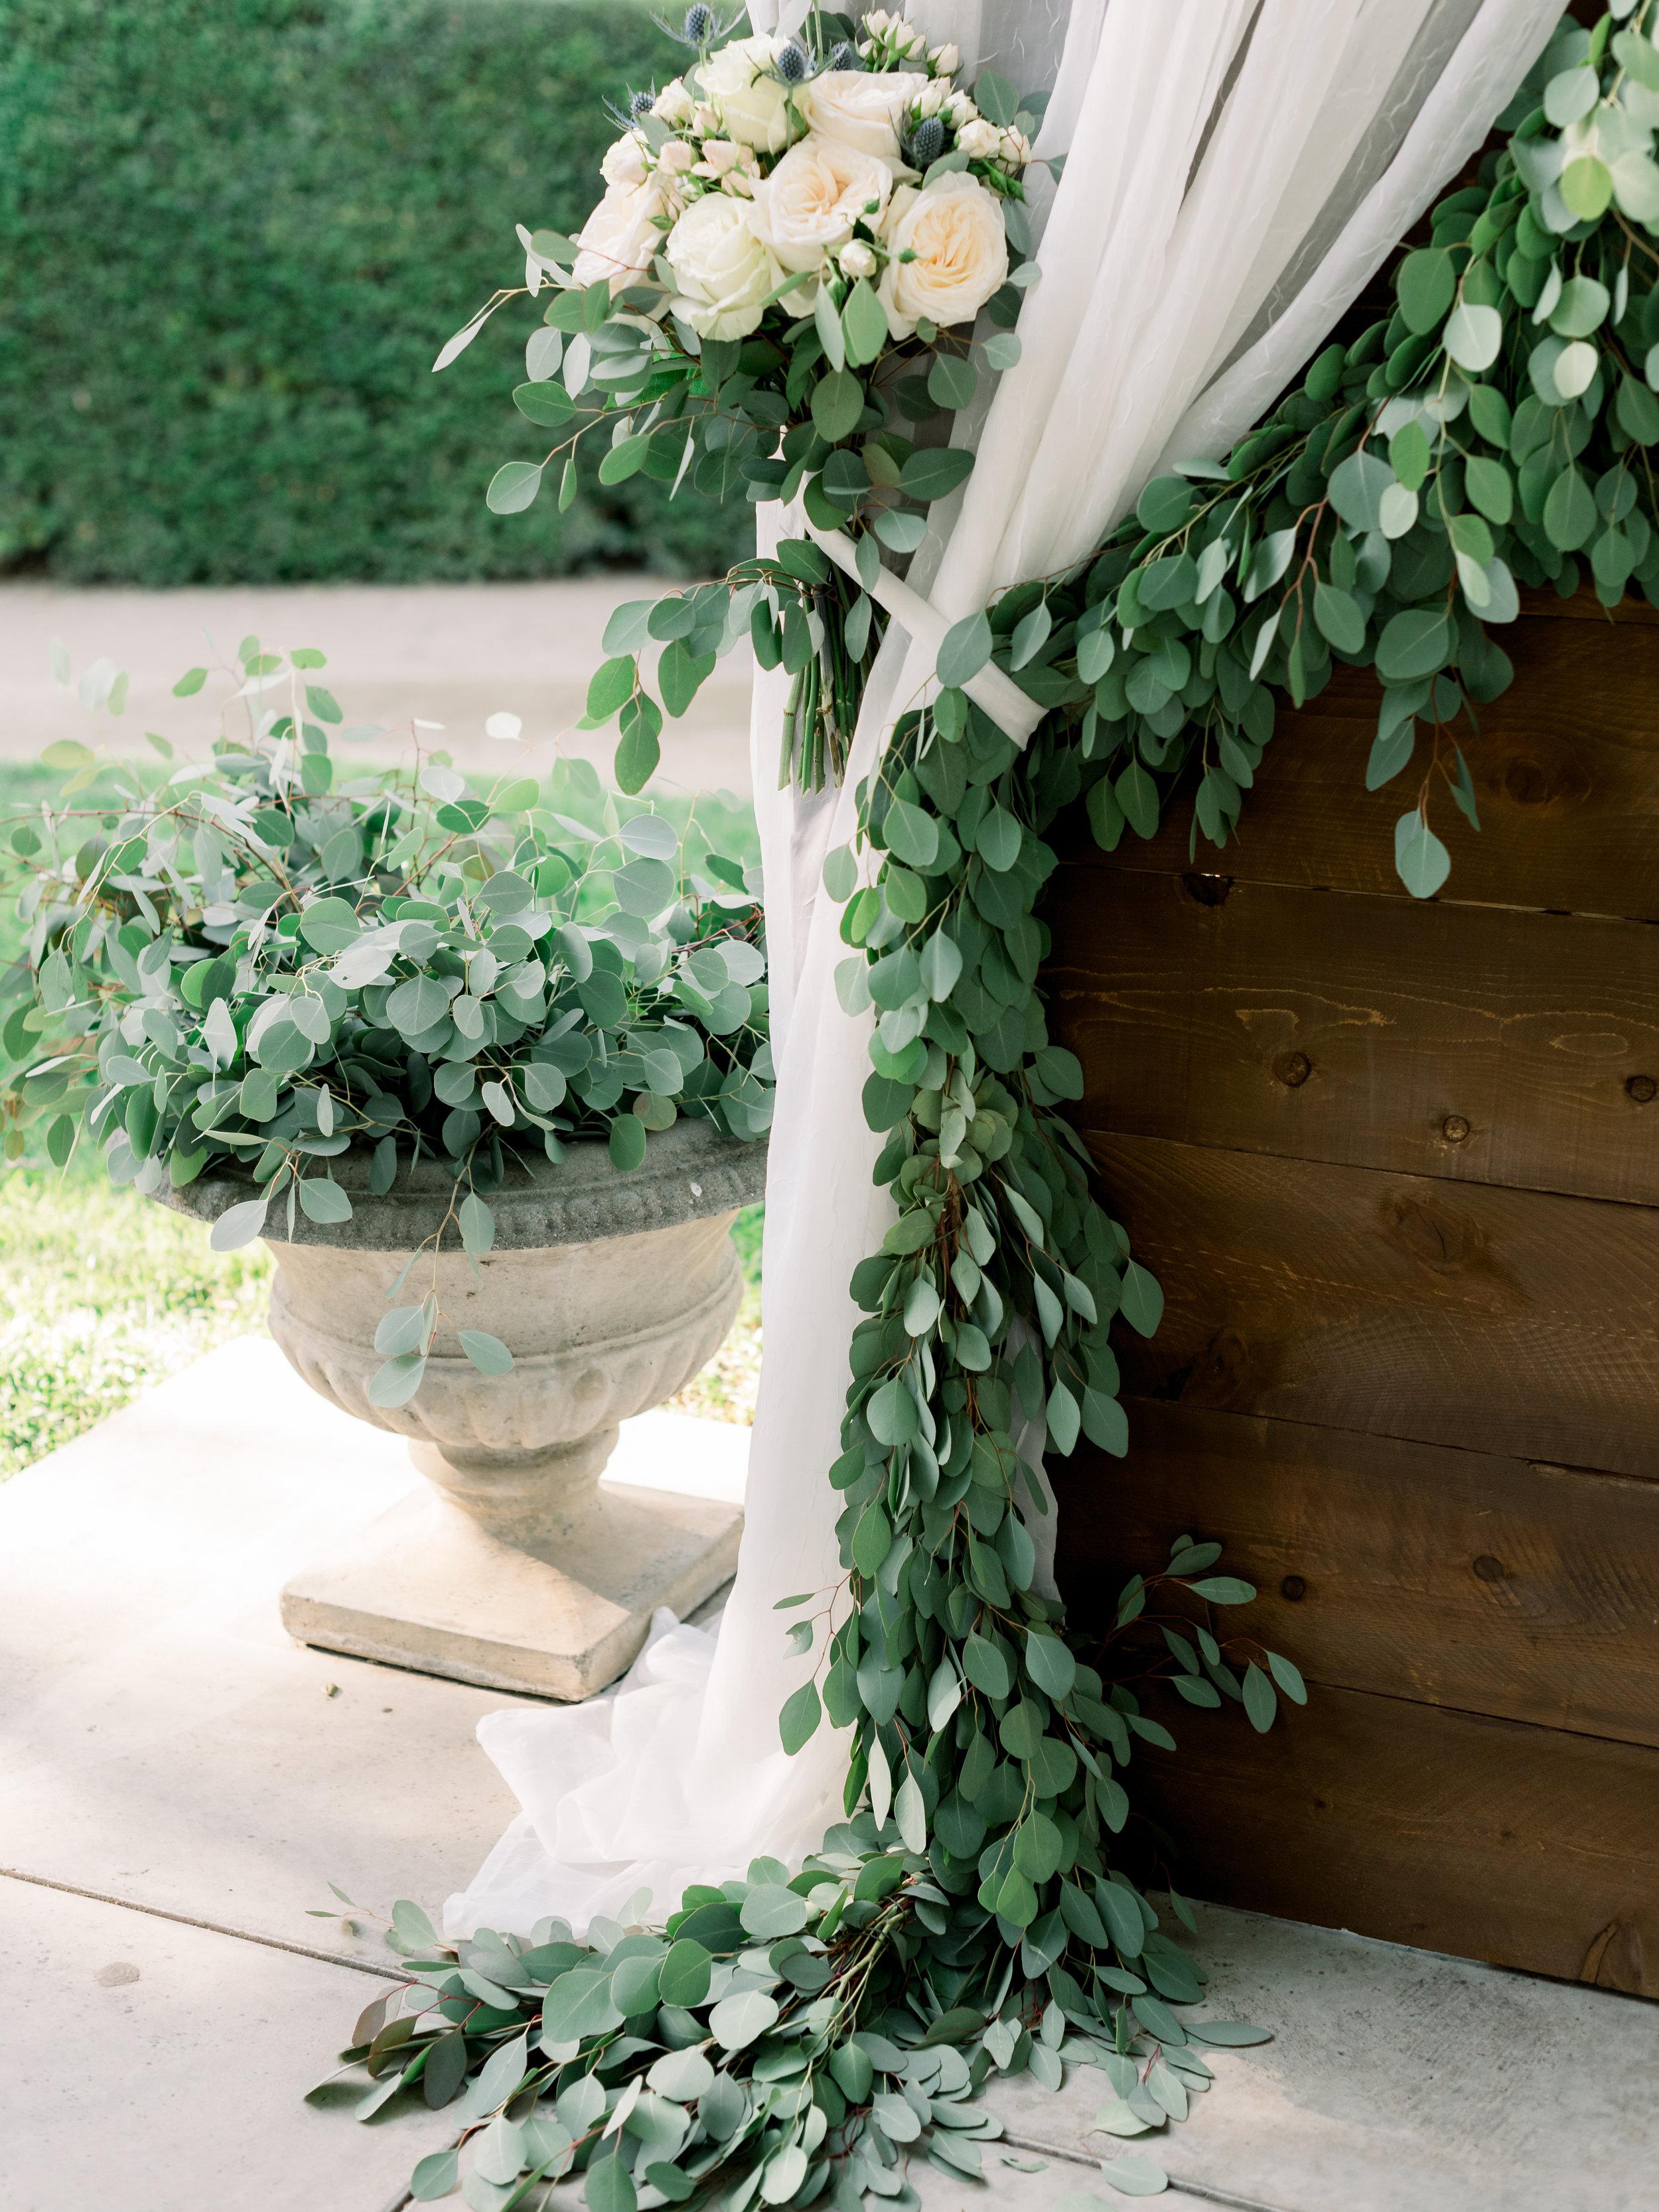 greenery-and-silk-wrapped-around-wedding-altar.jpg